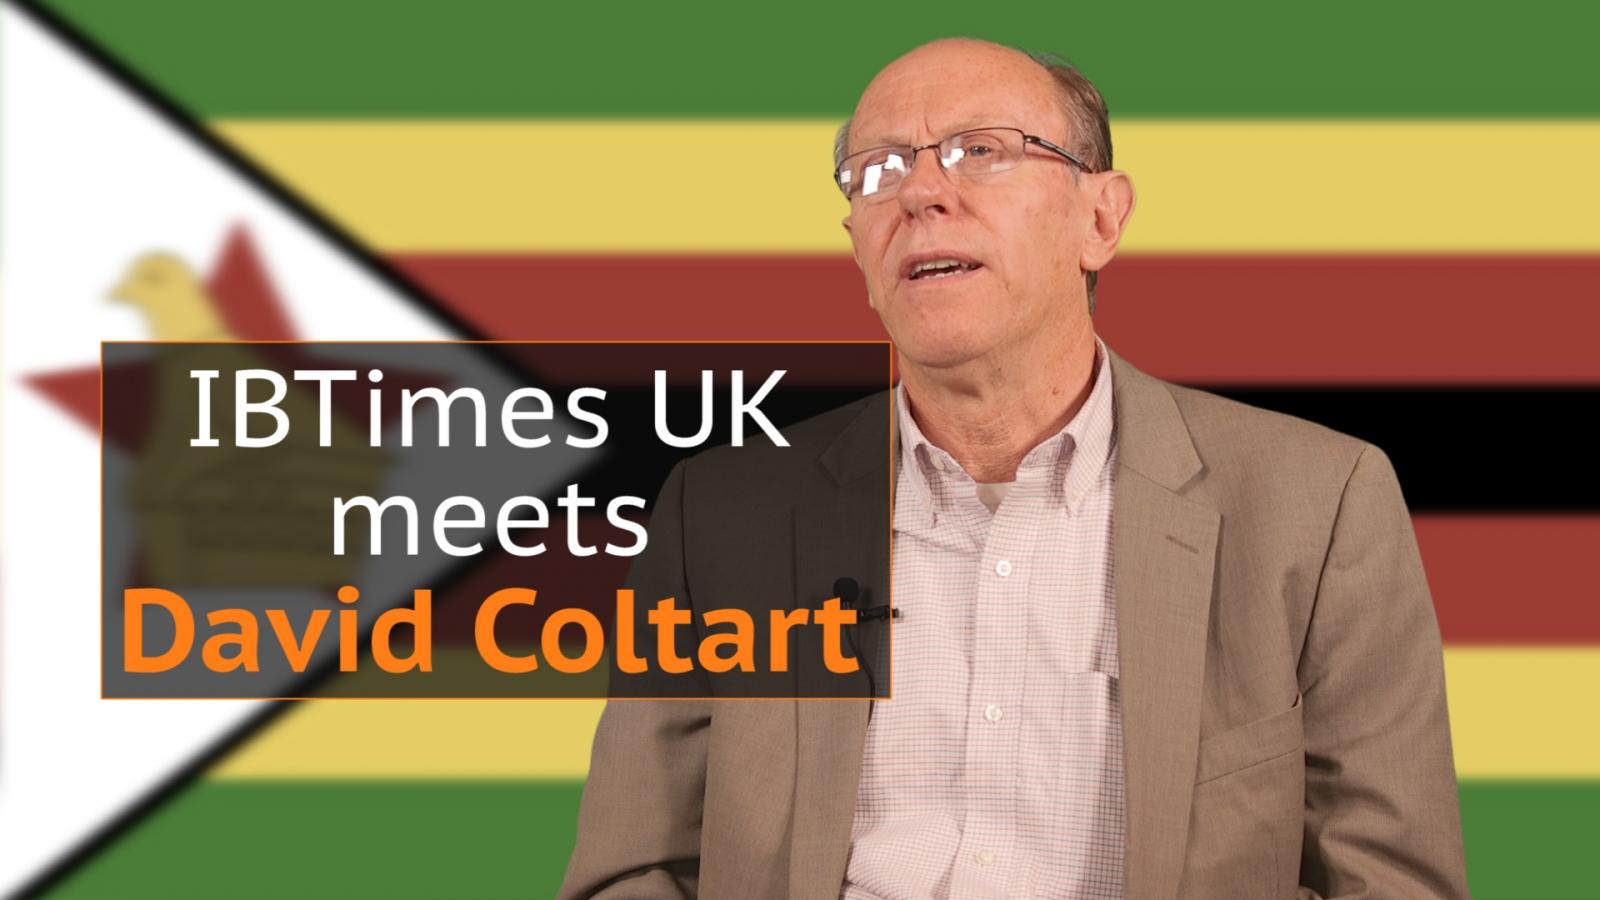 IBTimes UK meets David Coltart